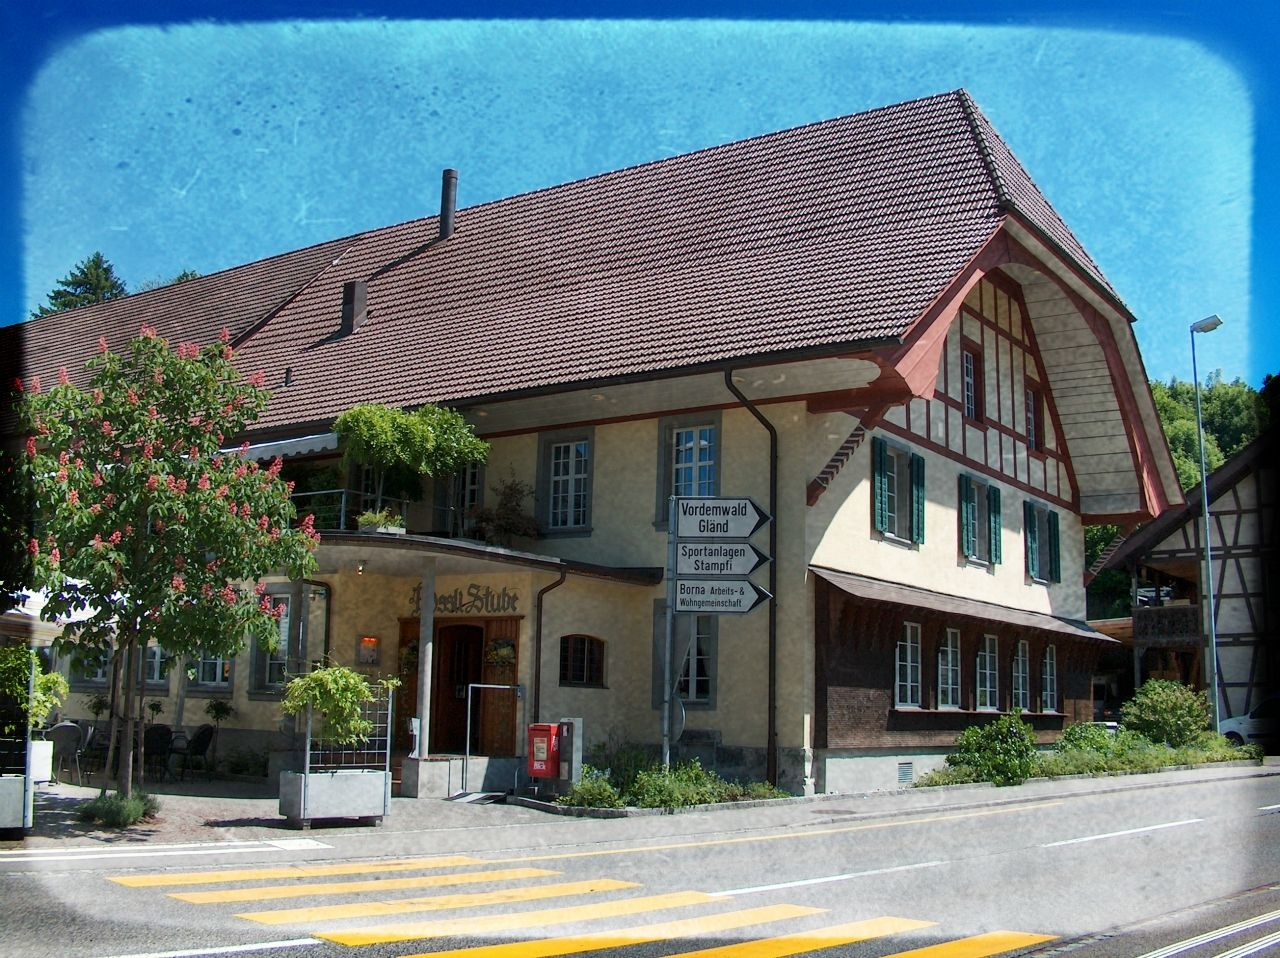 Rothrist Switzerland  city photos gallery : Restaurant Rössli, Rothrist | Germany & Switzerland | Pinterest